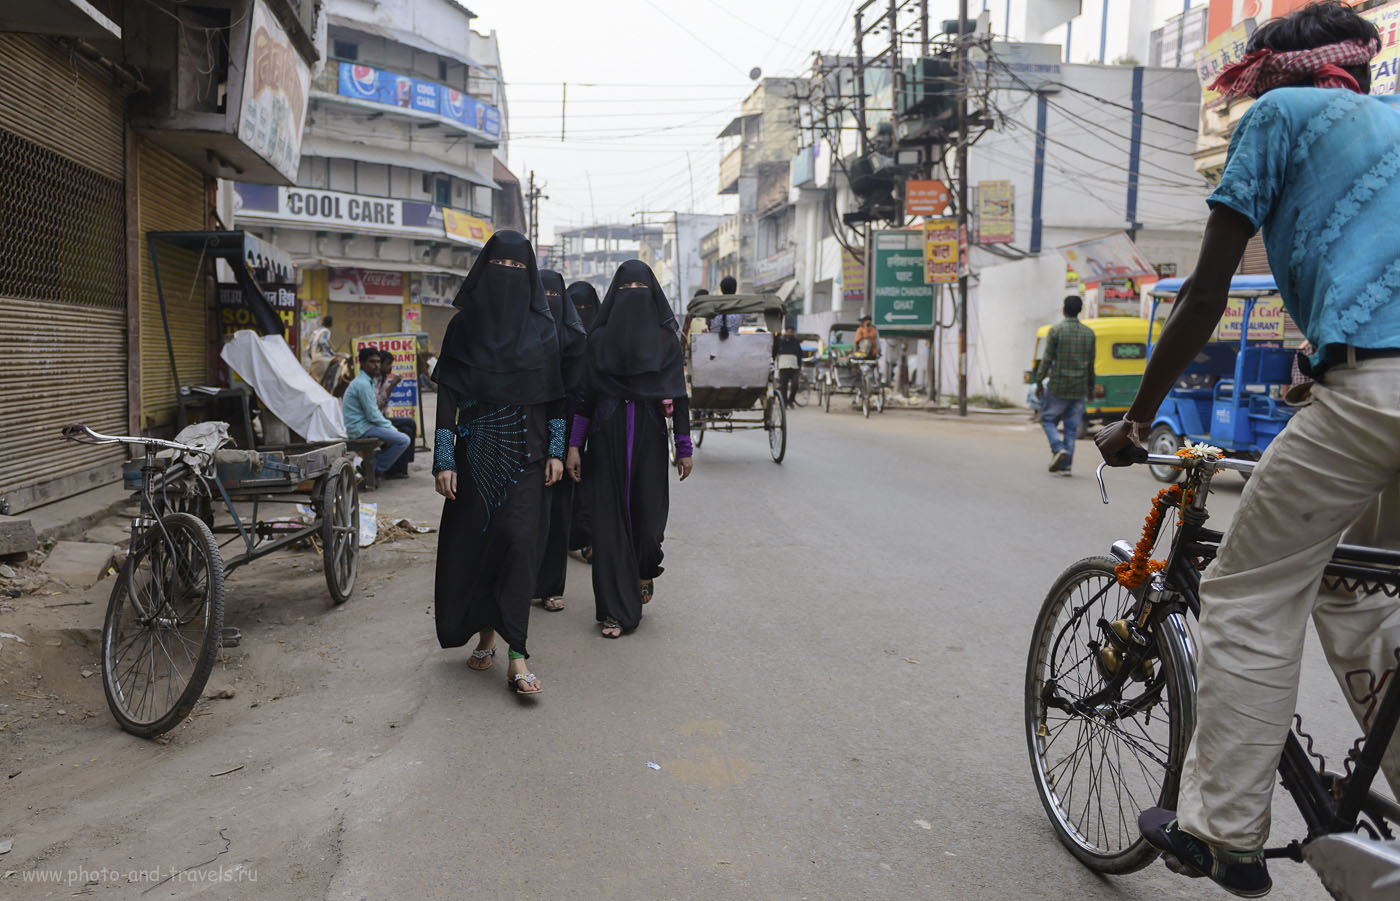 Фотография 19. Модницы на улицах Варанаси. 1/800, 2.8, 250, 24.